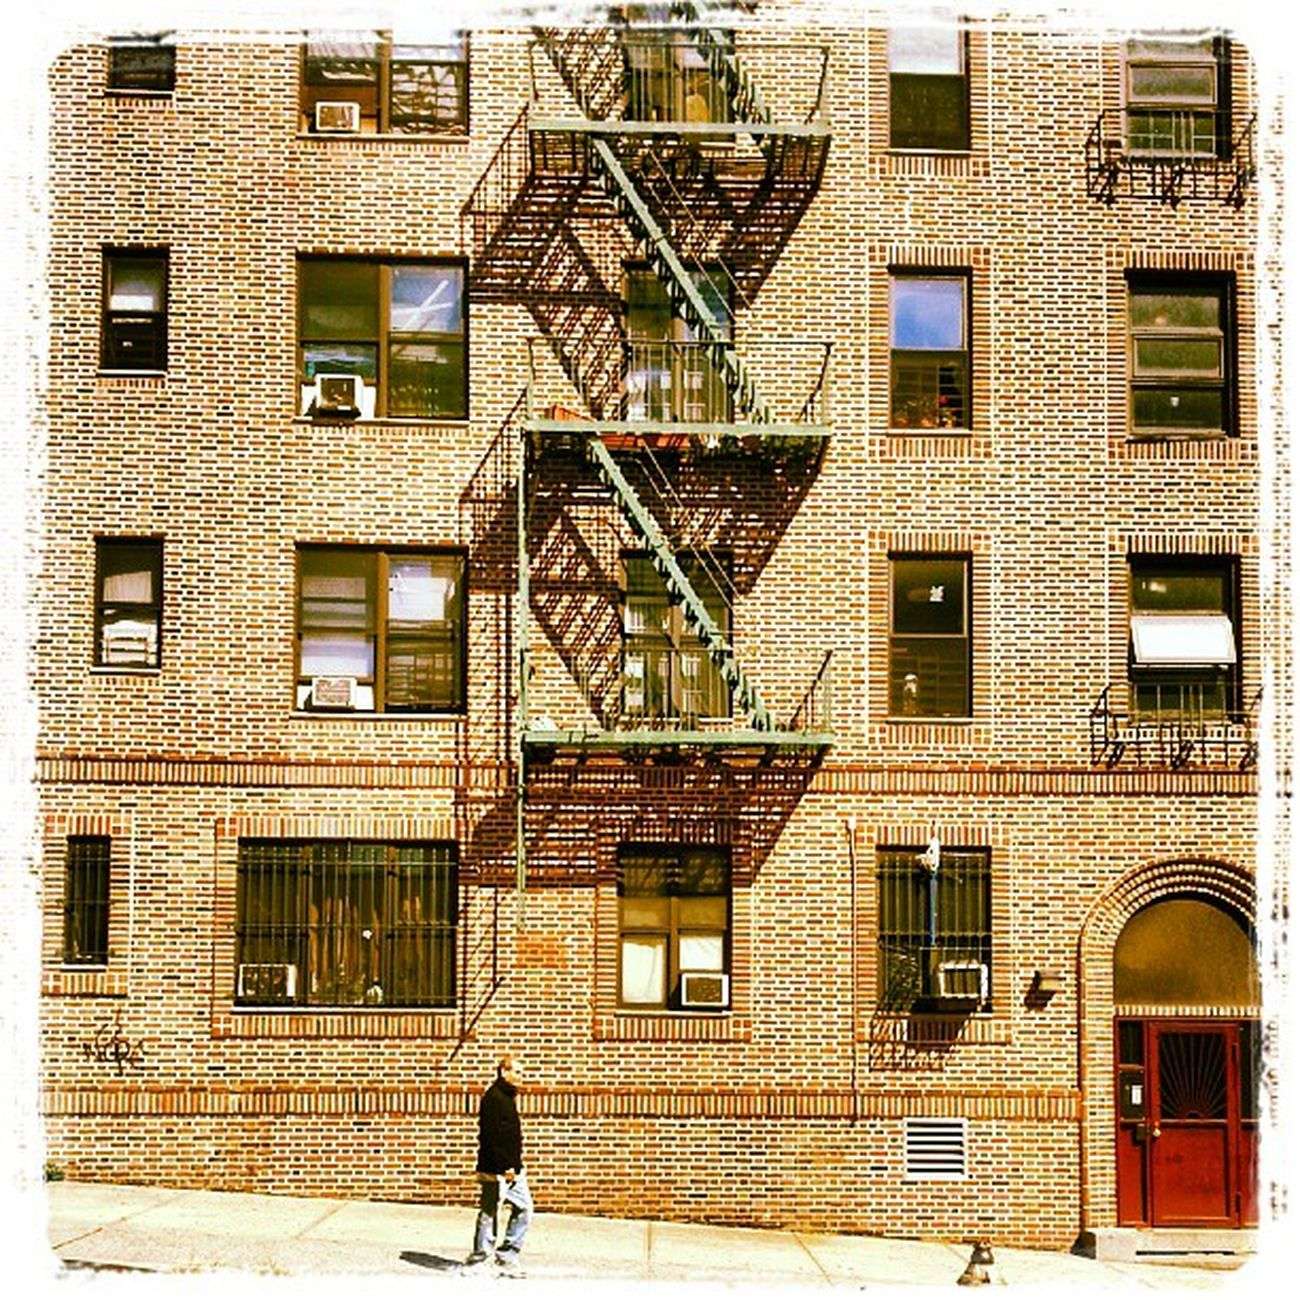 Neighborhood stroll. On my way to MoMA. Kelvin Lux Contrast NYC NewYork NewYorkCity Manhattan WashingtonHeights fireescape